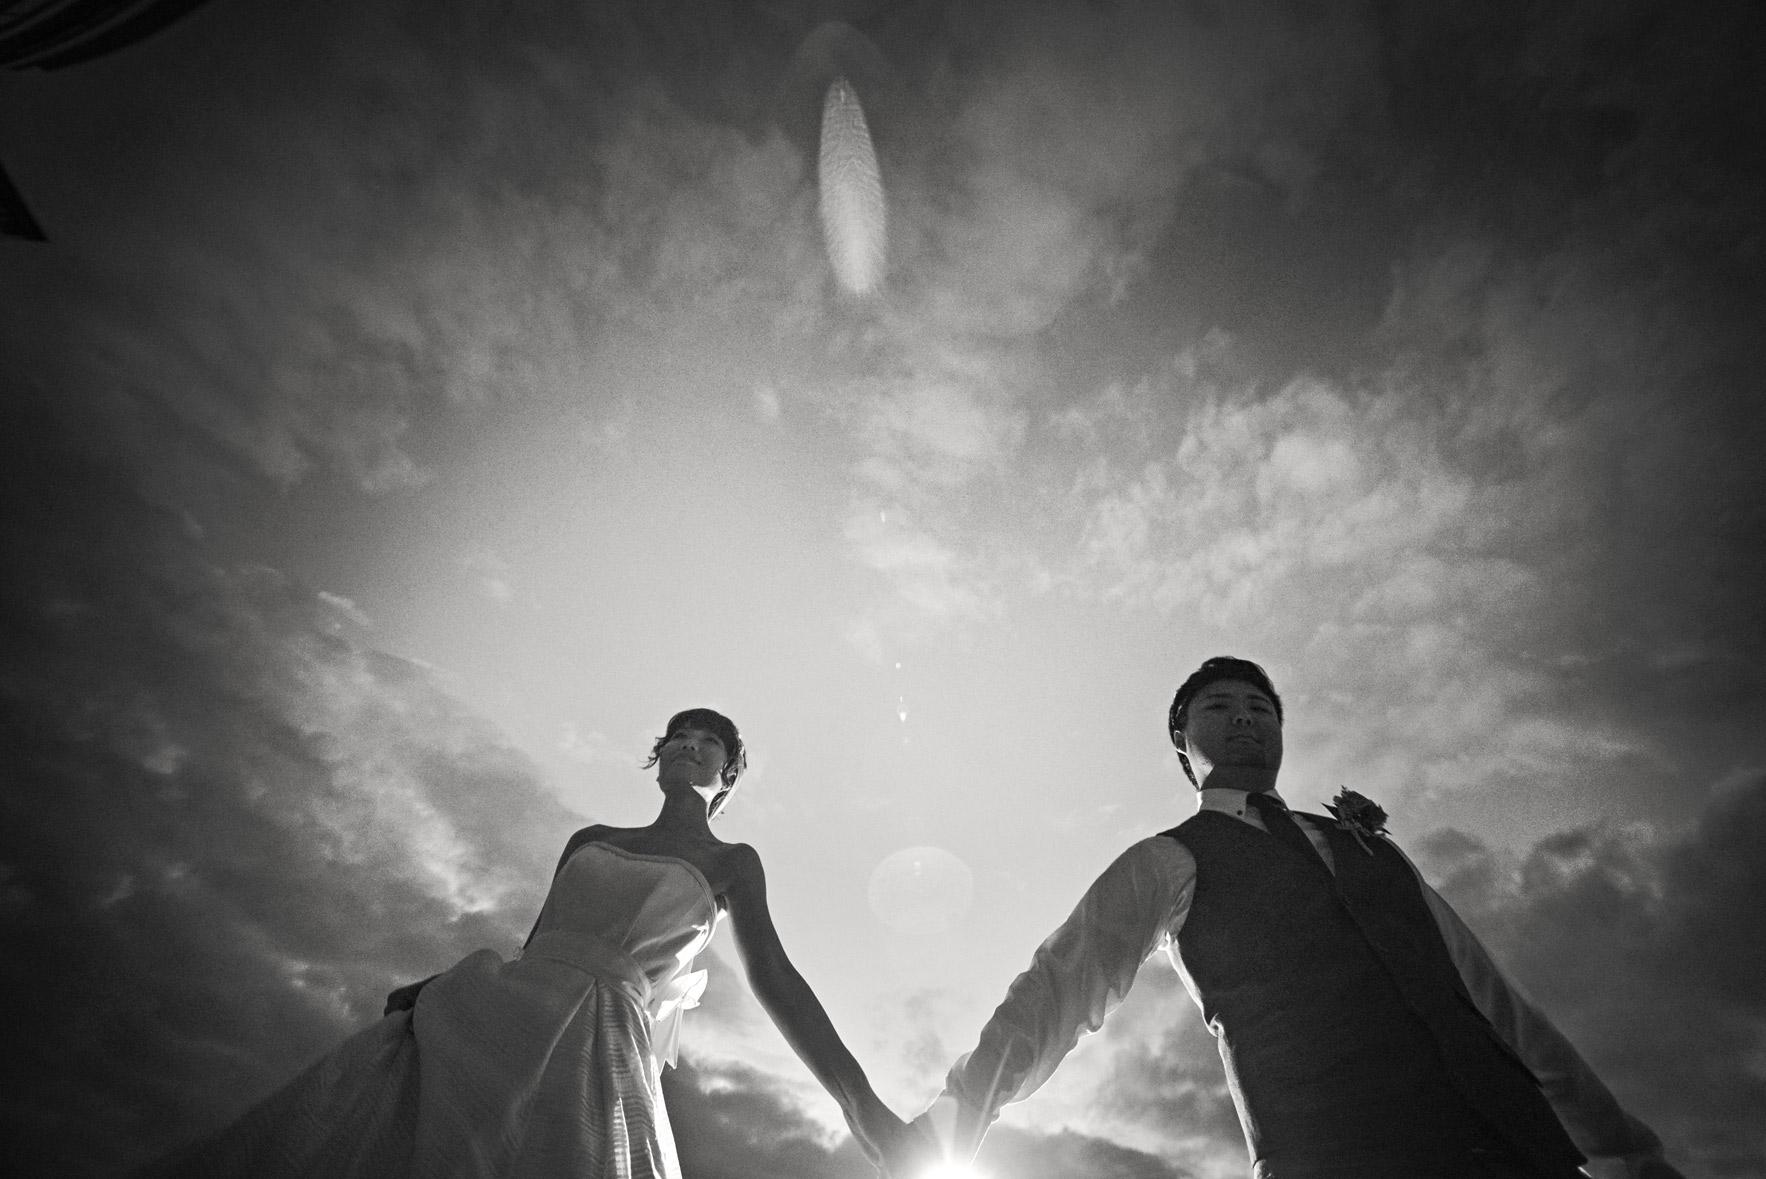 waikiki-beach-wedding-and-downtown-honolulu-hawaii-theater-stephen-ludwig-photography135.jpg